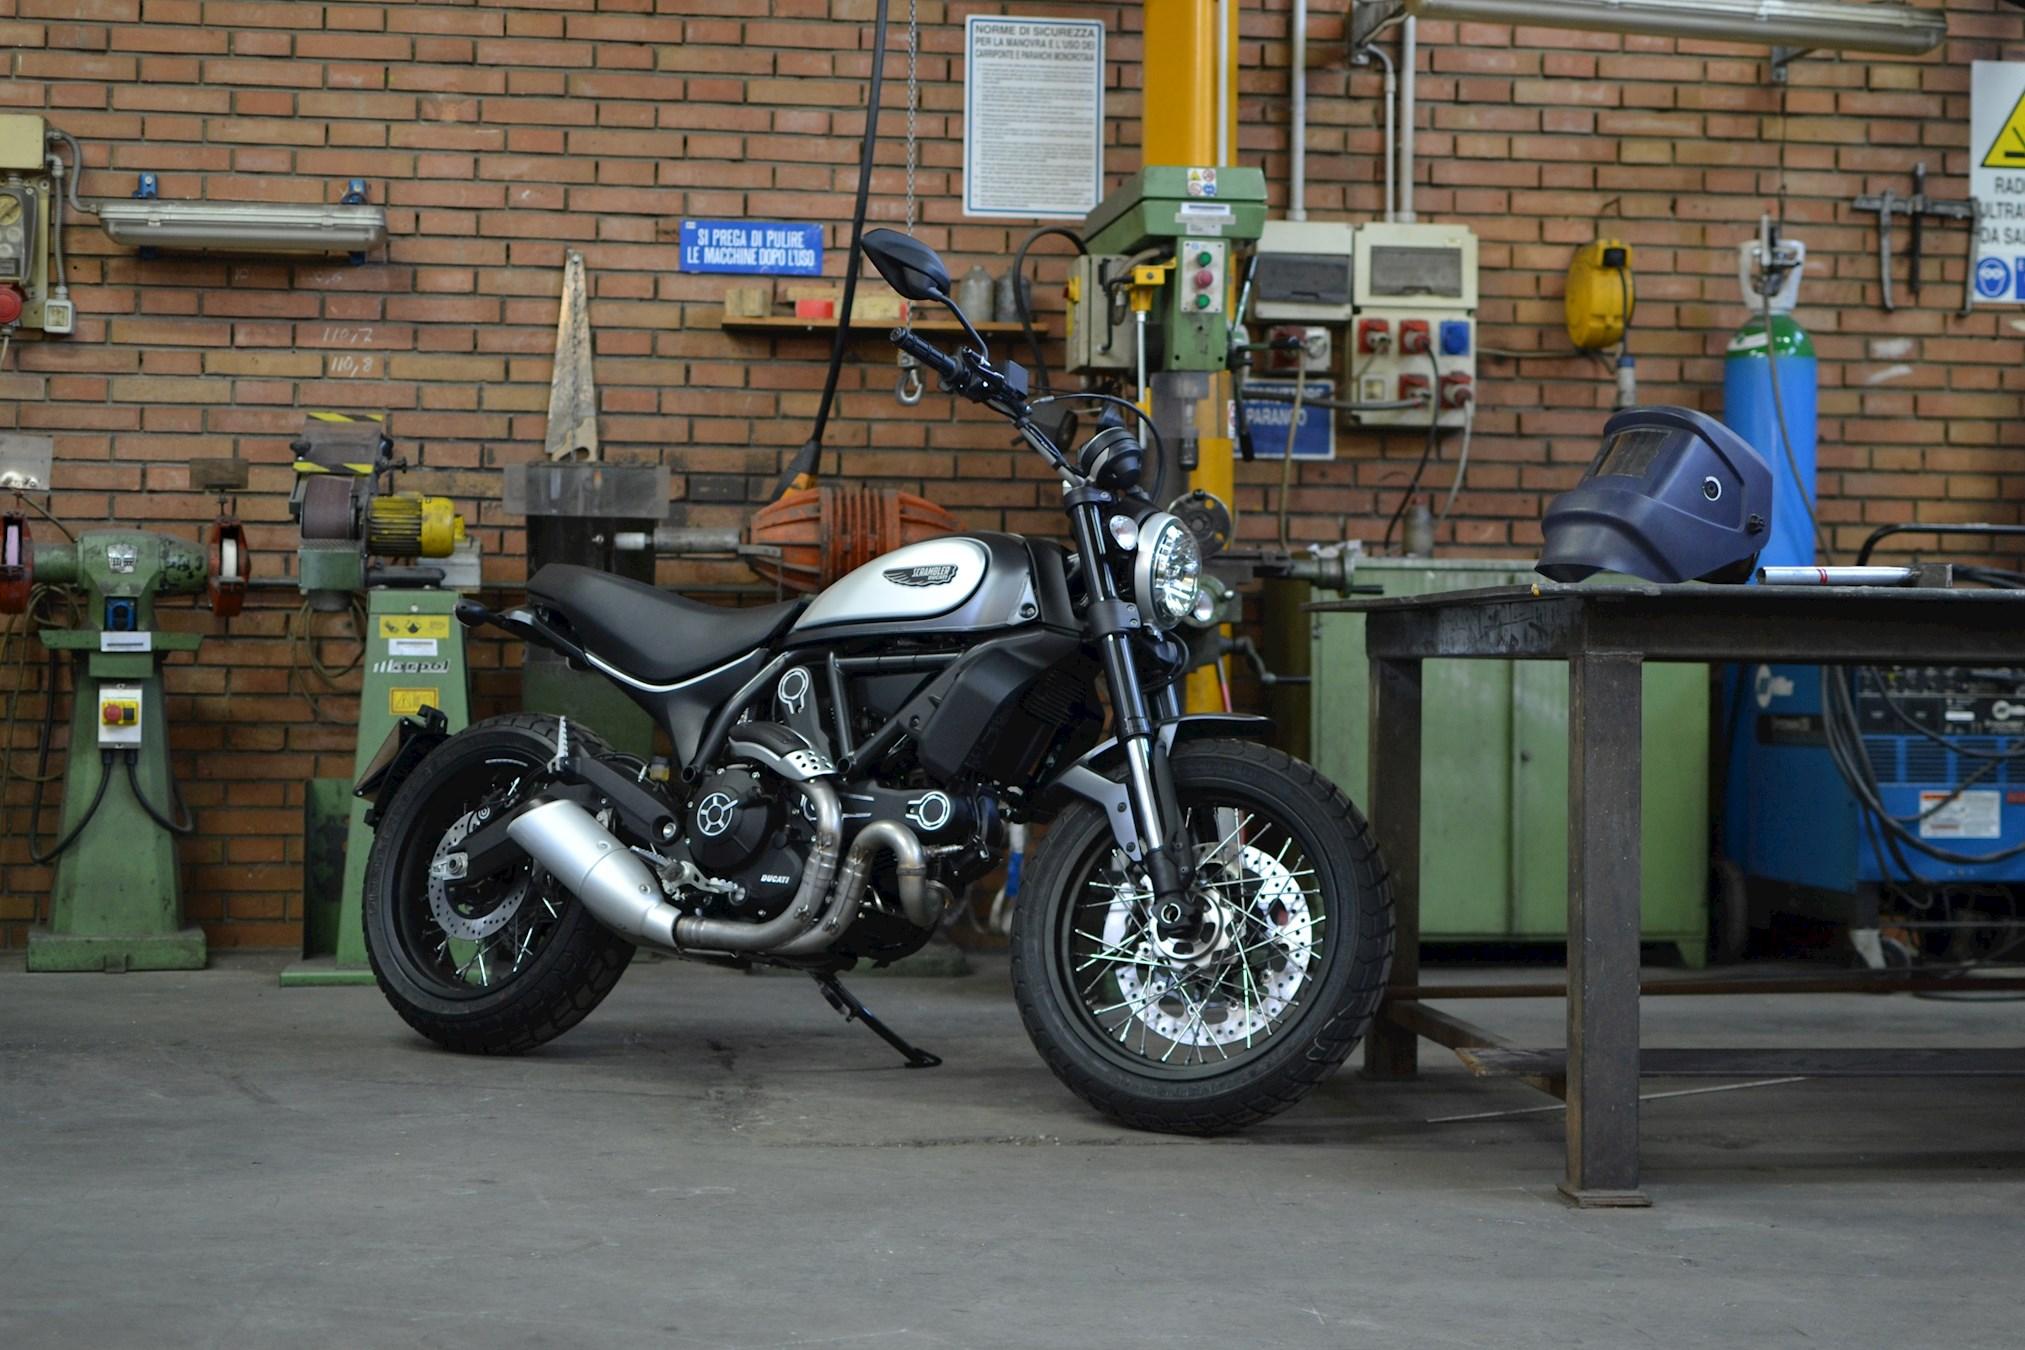 МОТОЦИКЛ DUCATI SCRAMBLER STREET CLASSIC ― Артмото - купить квадроцикл в украине и харькове, мотоцикл, снегоход, скутер, мопед, электромобиль